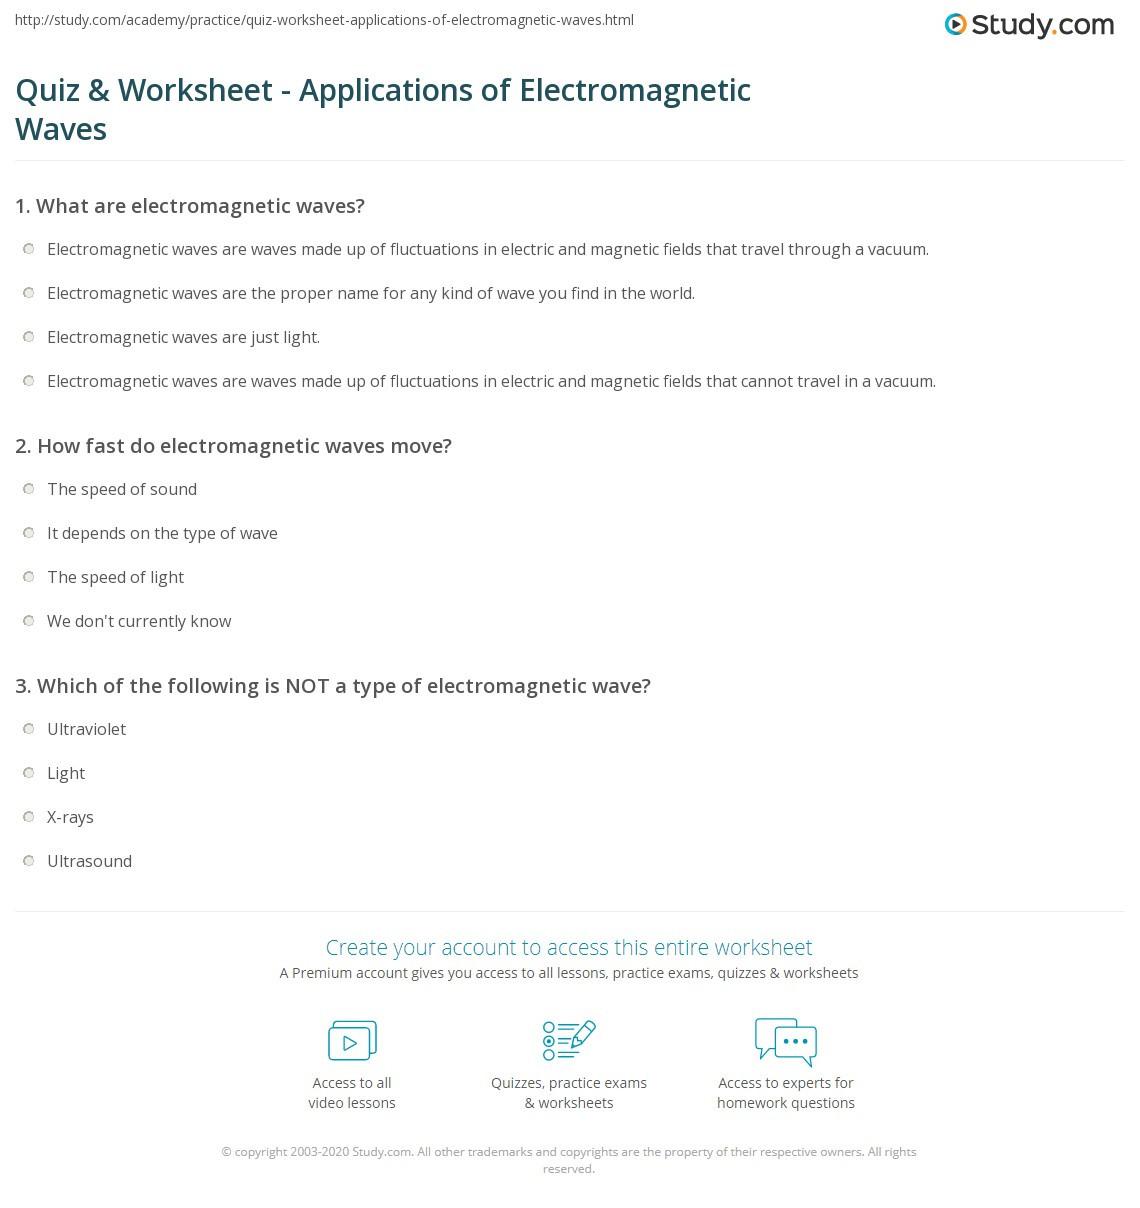 Quiz & Worksheet Applications of Electromagnetic Waves